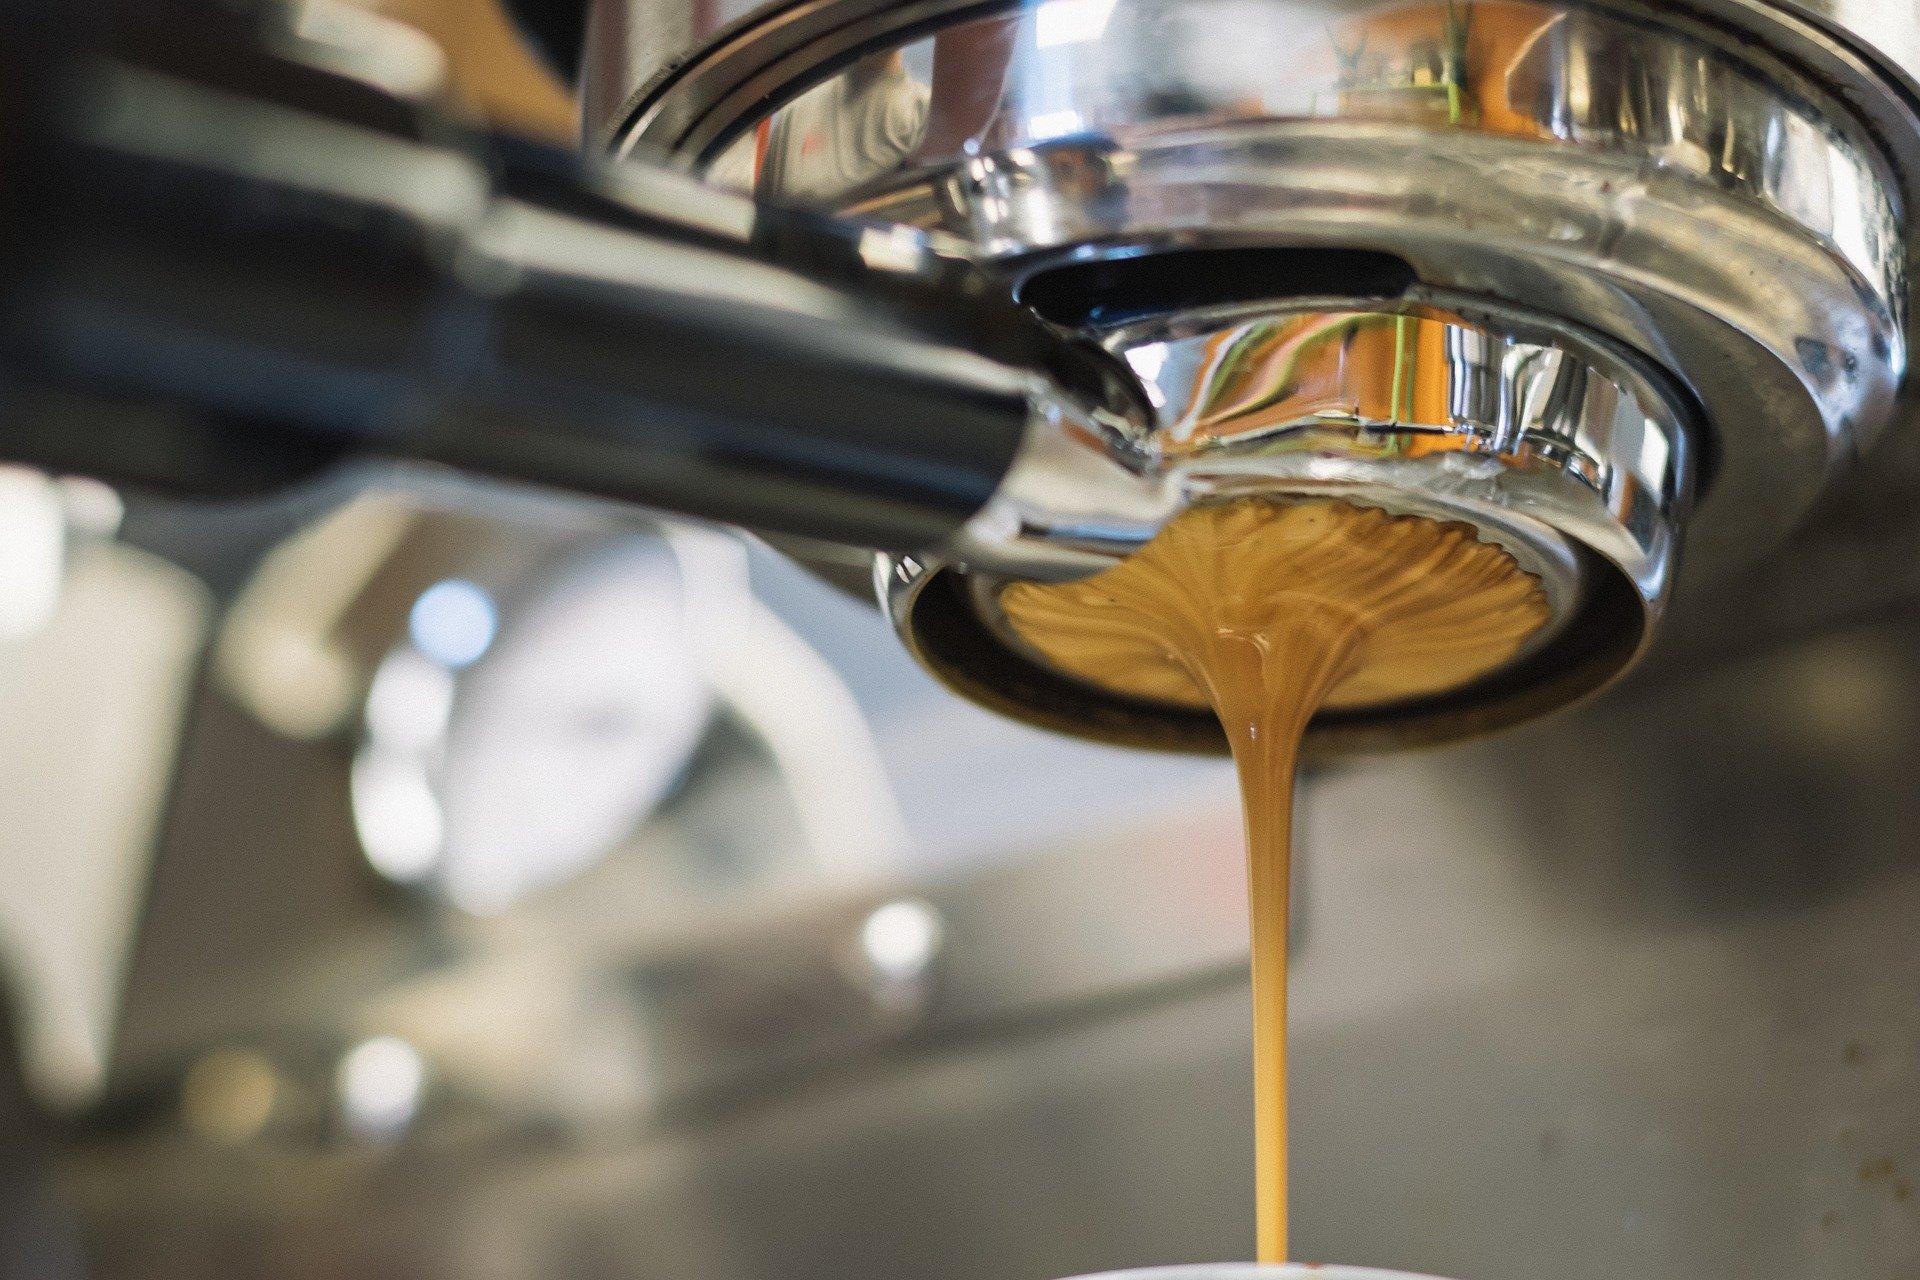 Espresso coming through a portafilter - best automatic espresso machines